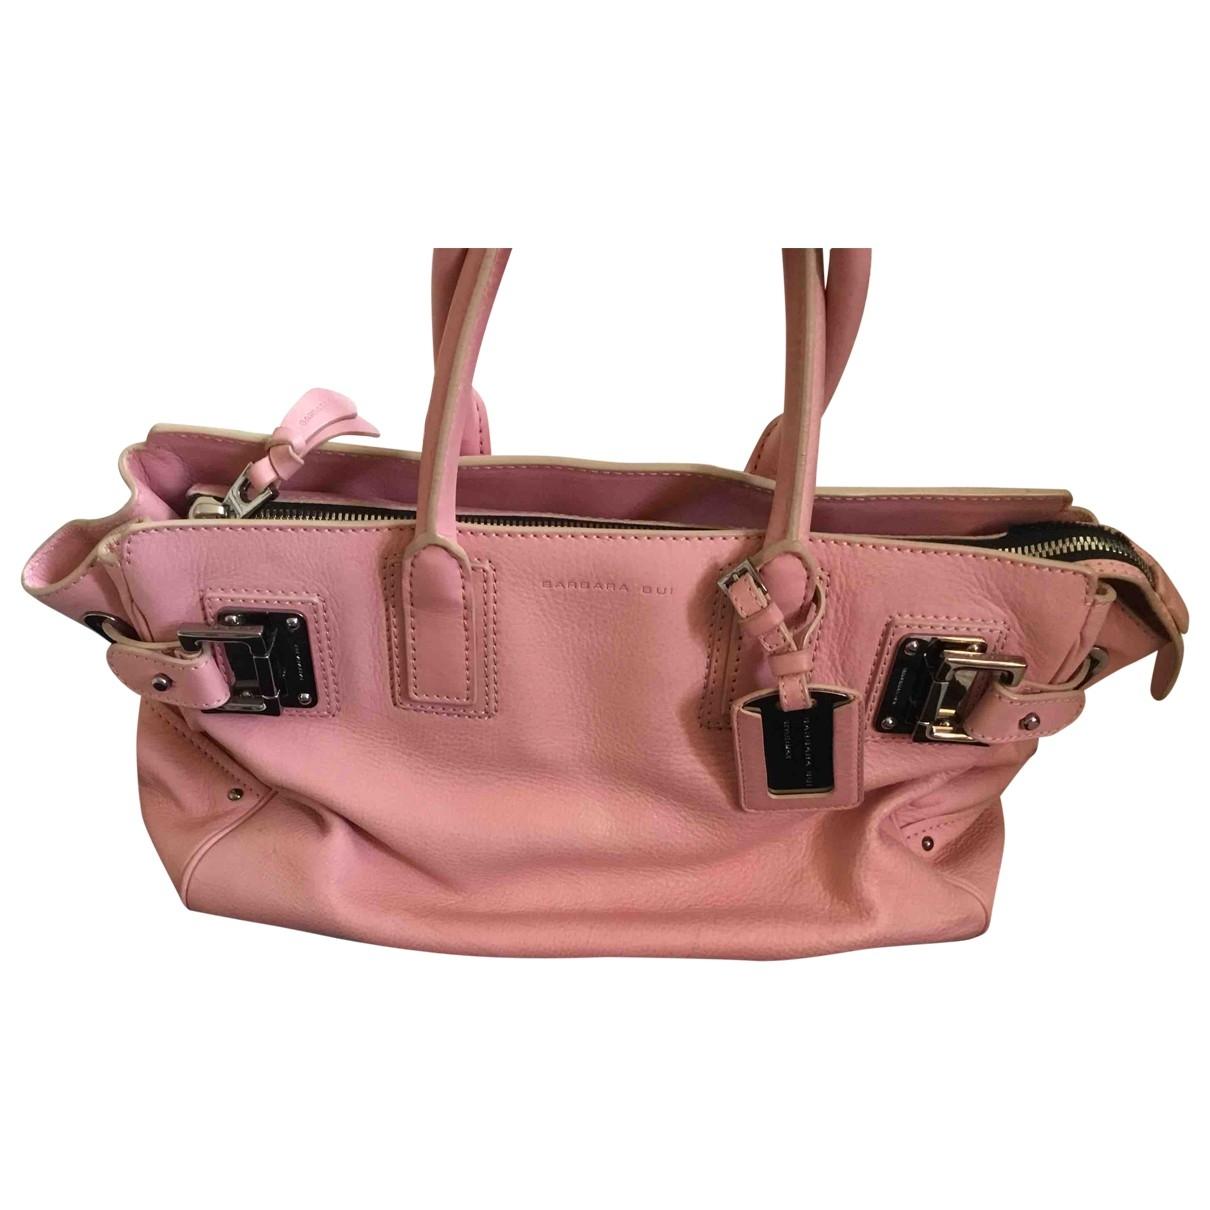 Barbara Bui \N Pink Leather handbag for Women \N